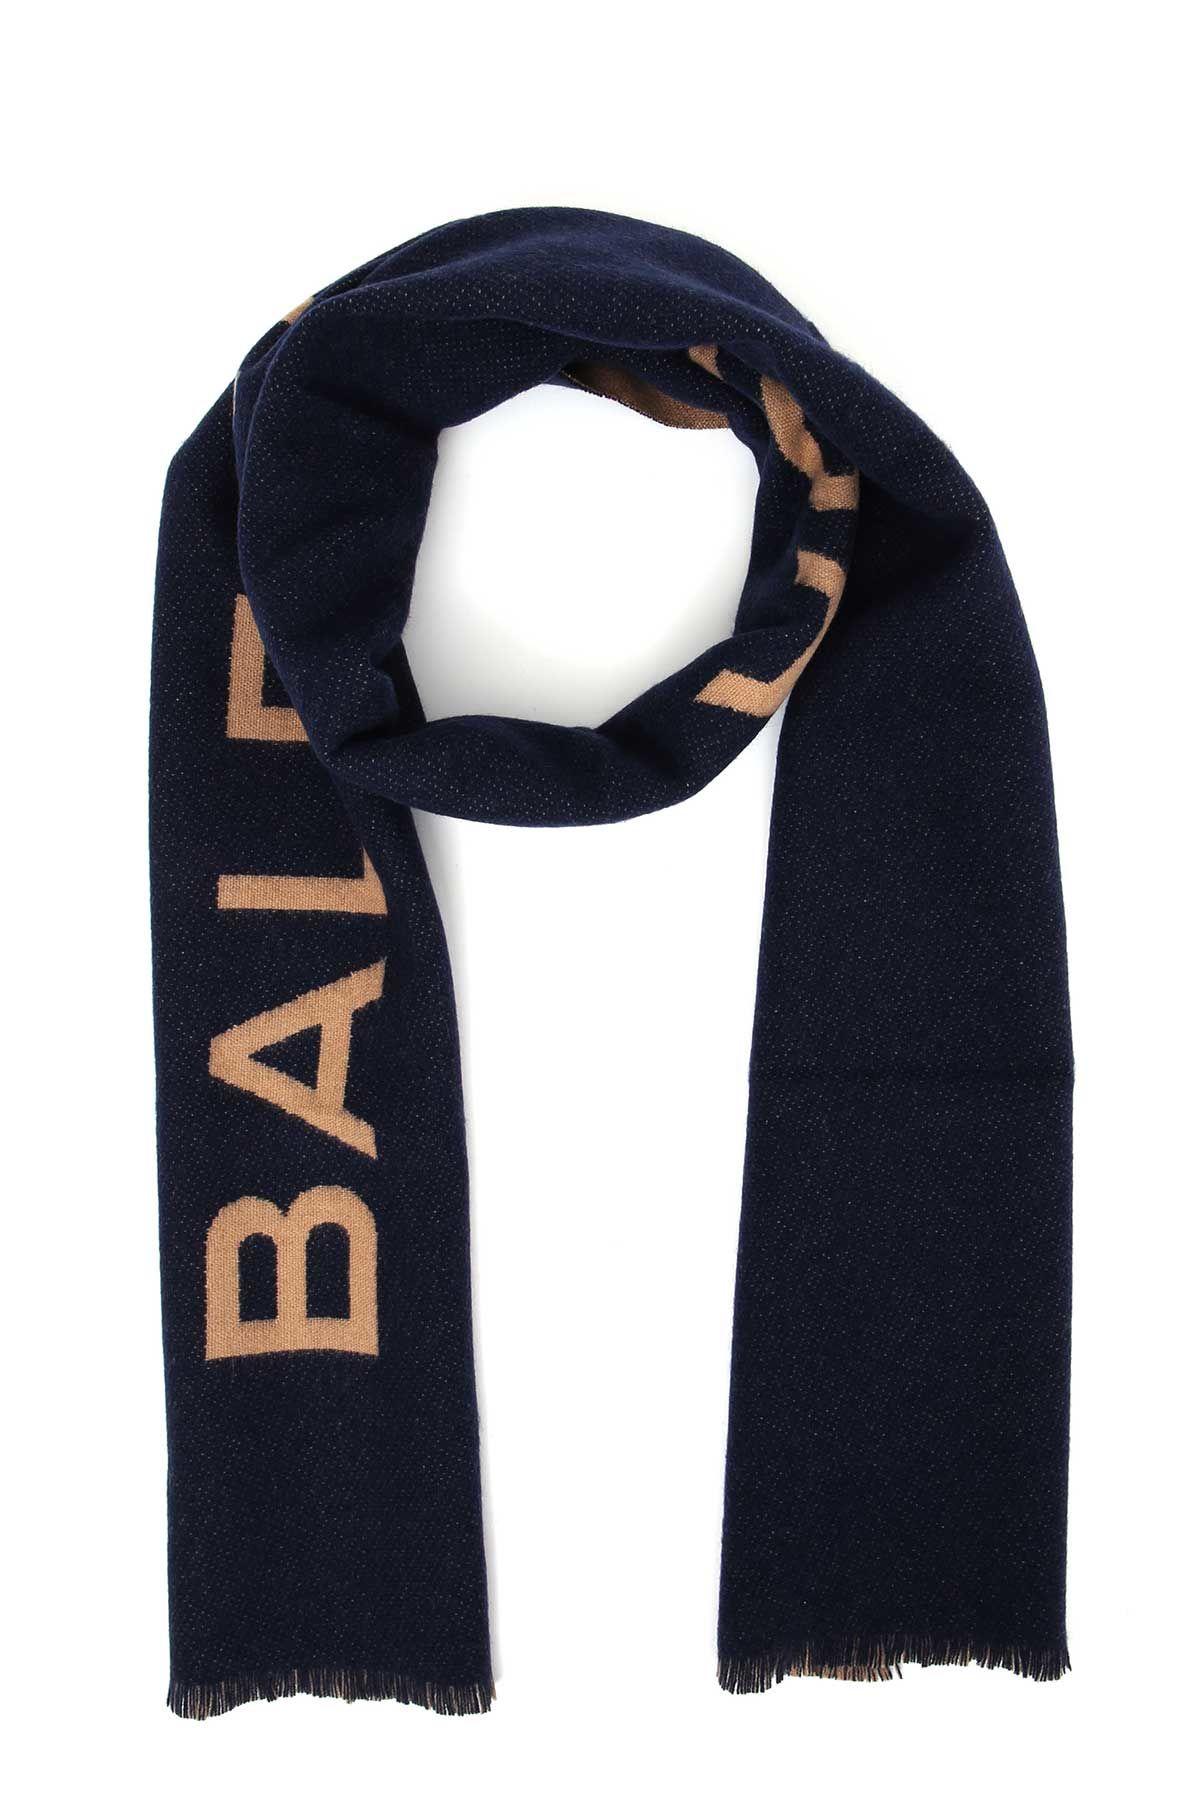 Balenciaga Cashmere Scarf With Big Logo